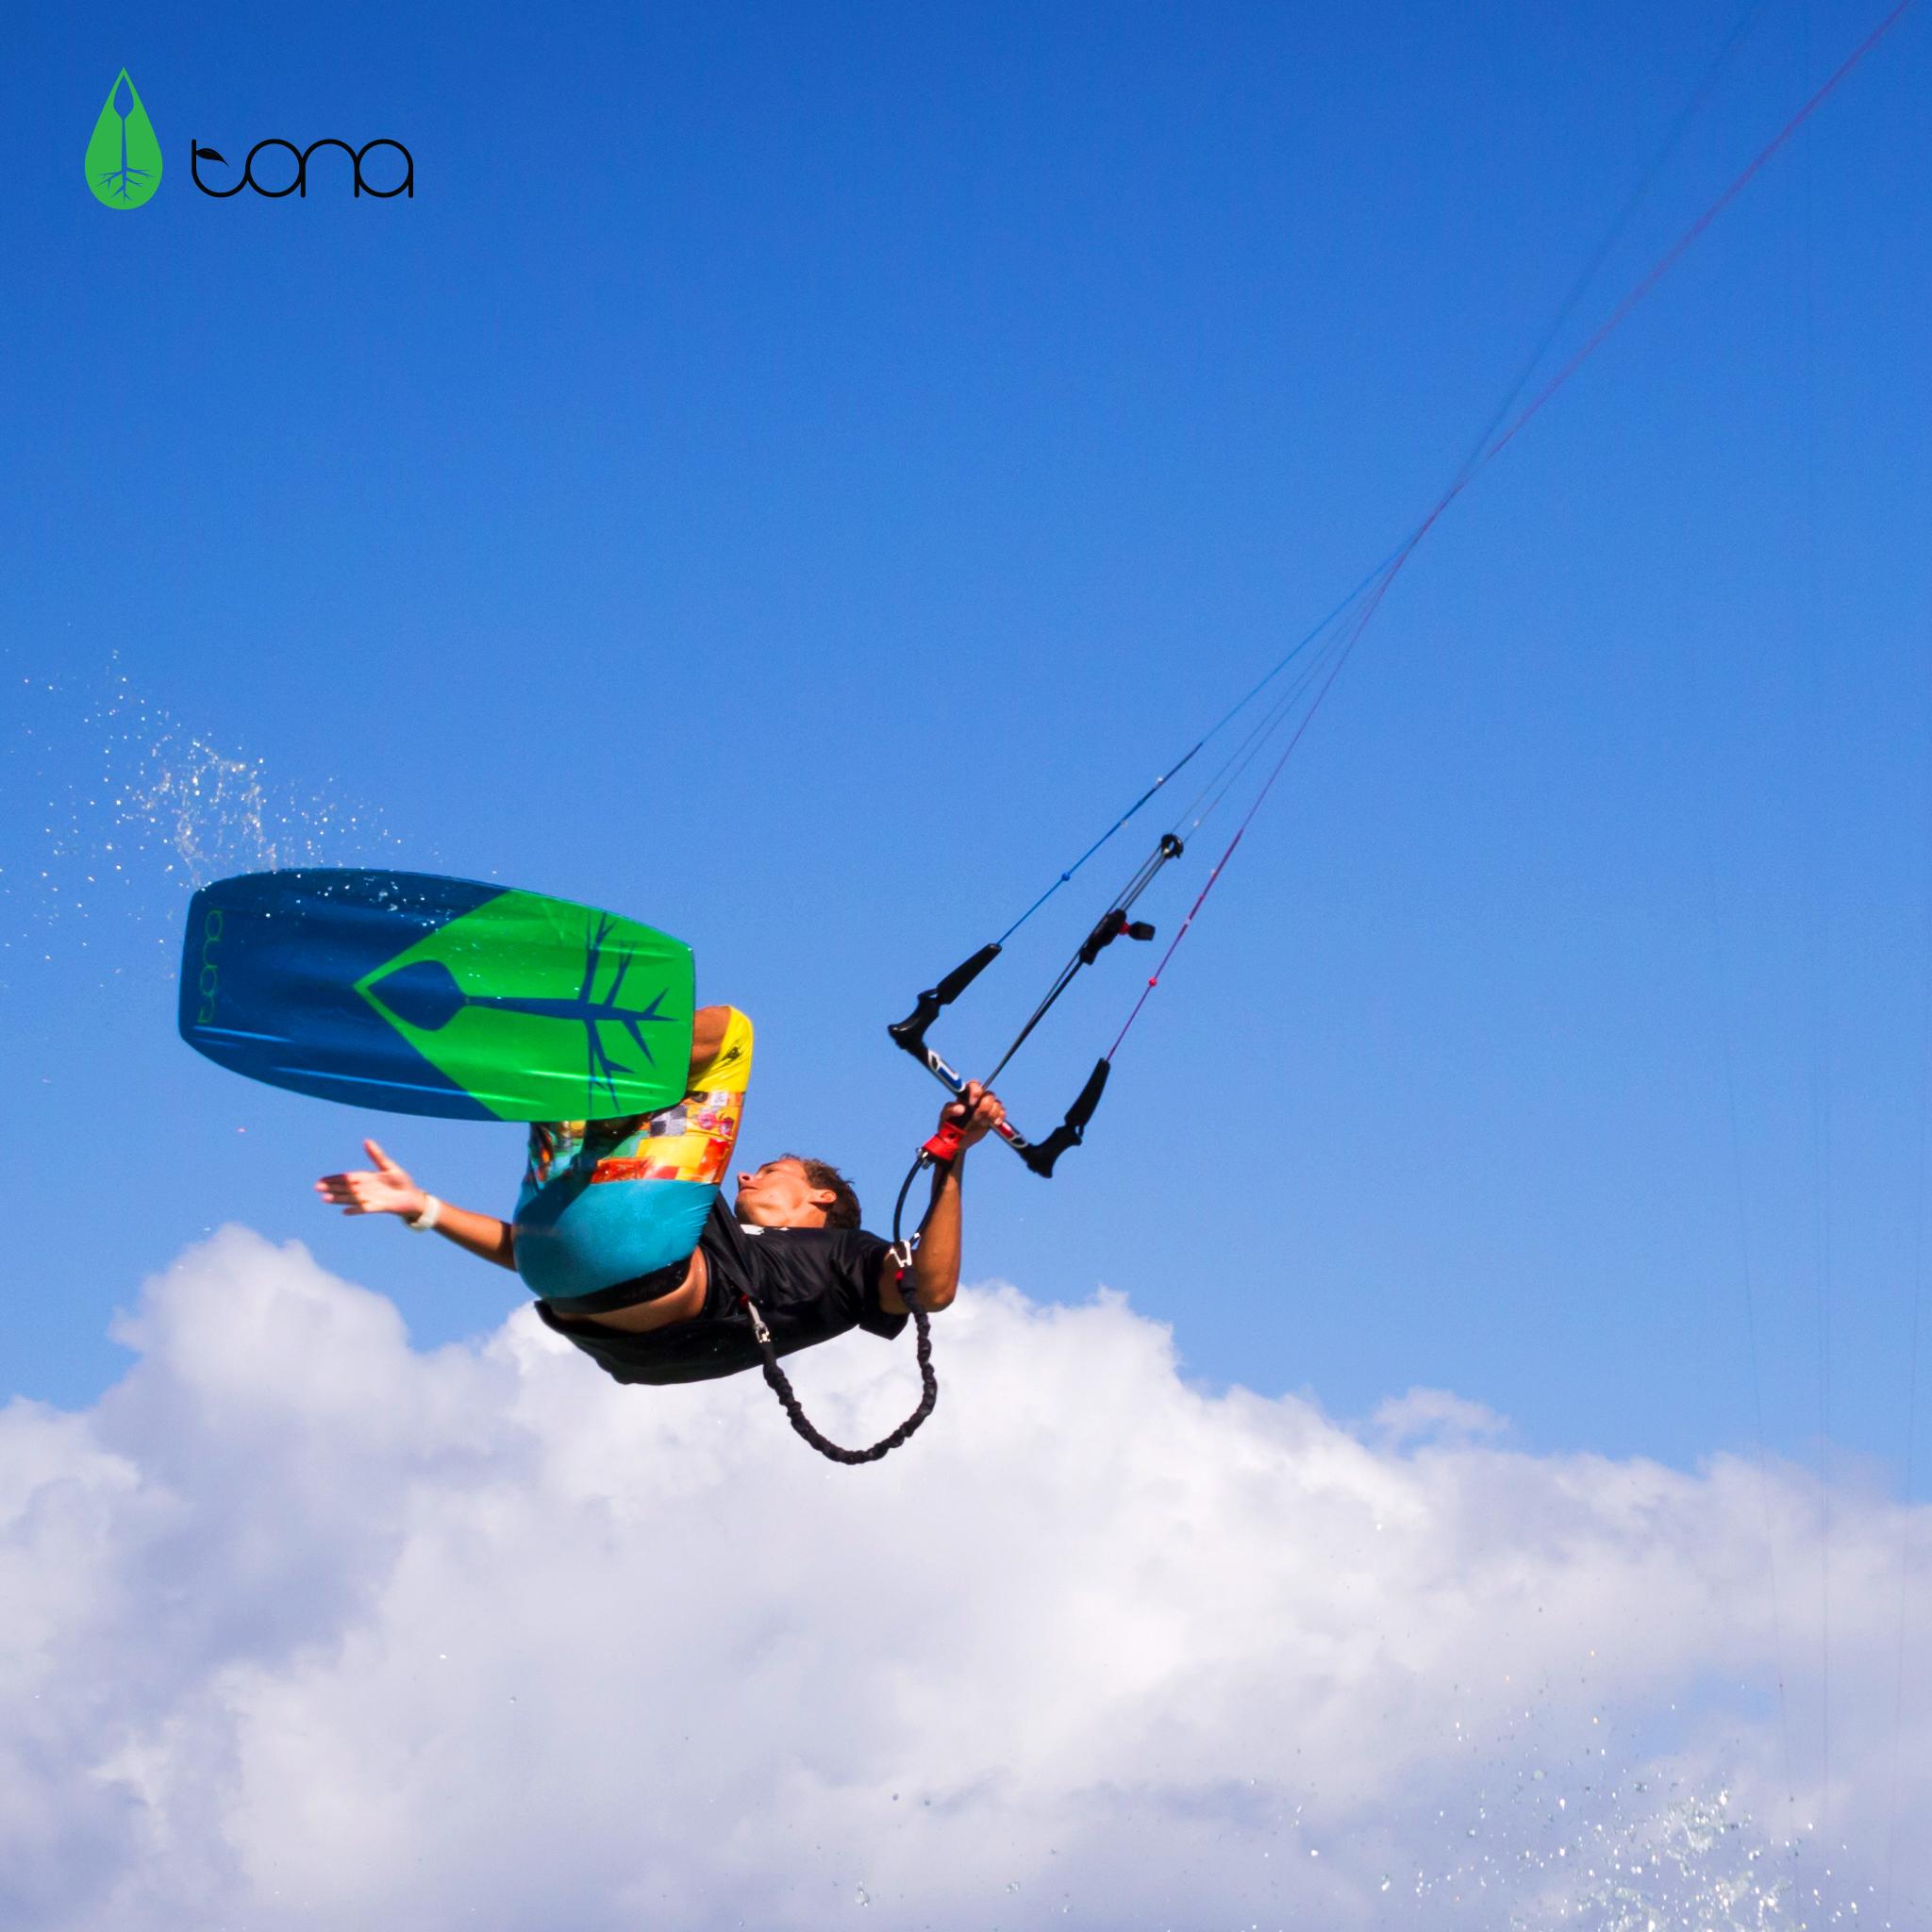 kitesurf wallpaper image - Jake Kelsick on the Tona Pop board handlepassing awefully close a C4 Ozone kite - in resolution: iPad 2 & 3 2048 X 2048